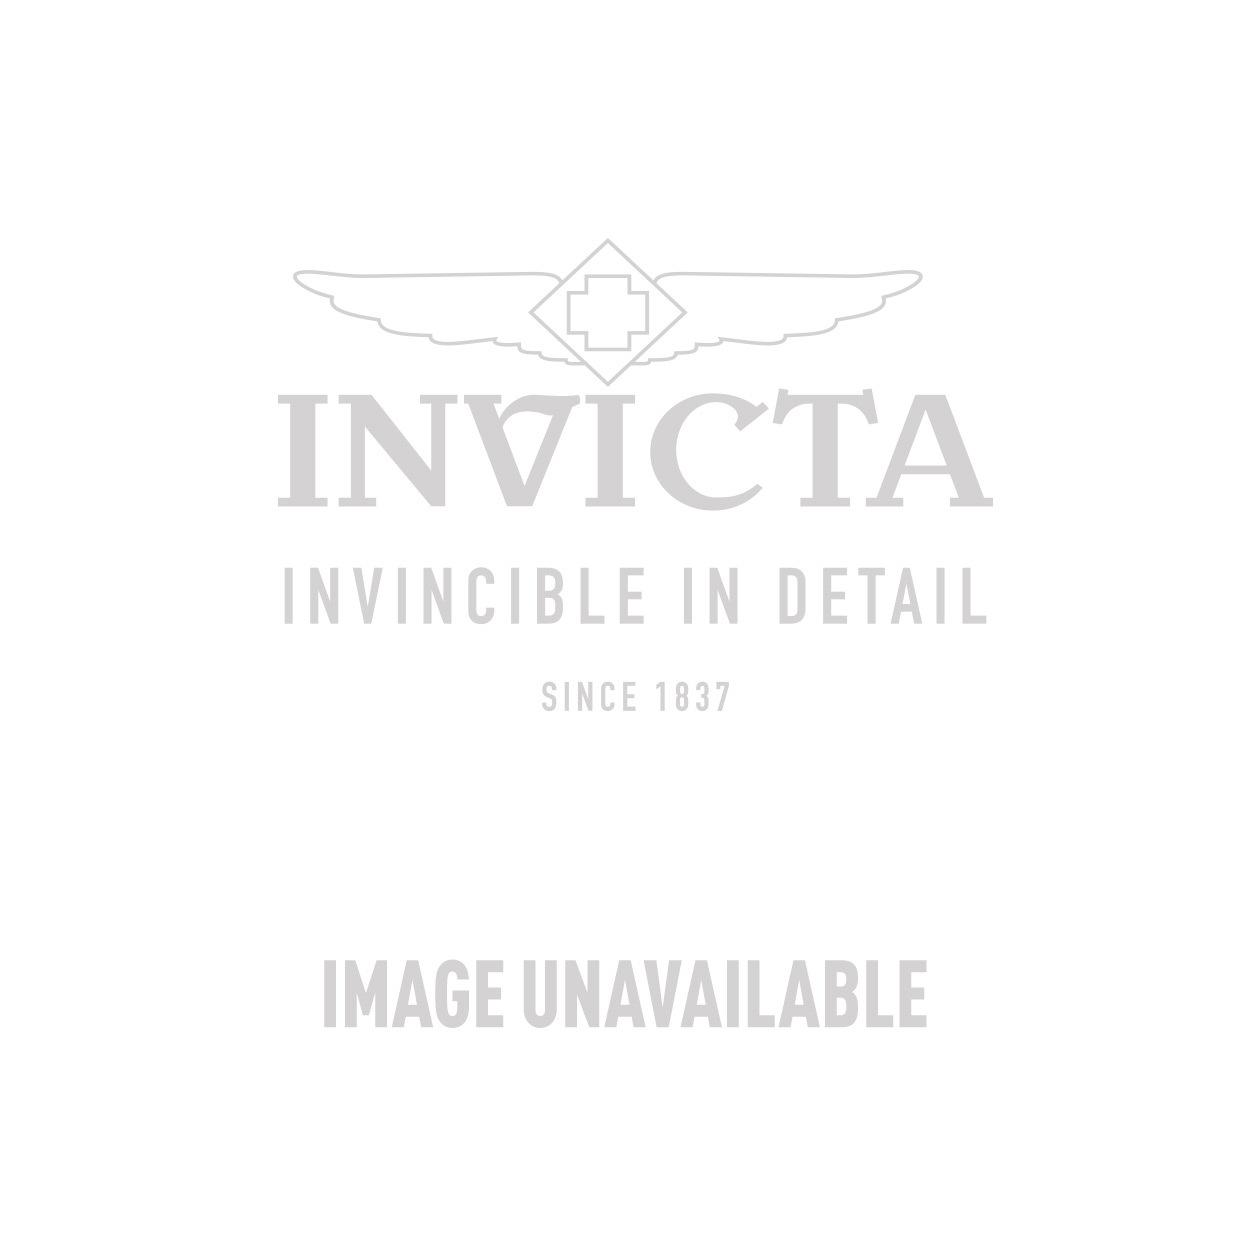 Invicta Sea Spider Mechanical Watch - Gunmetal case with Gunmetal, Grey tone Stainless Steel, Polyurethane band - Model 10355